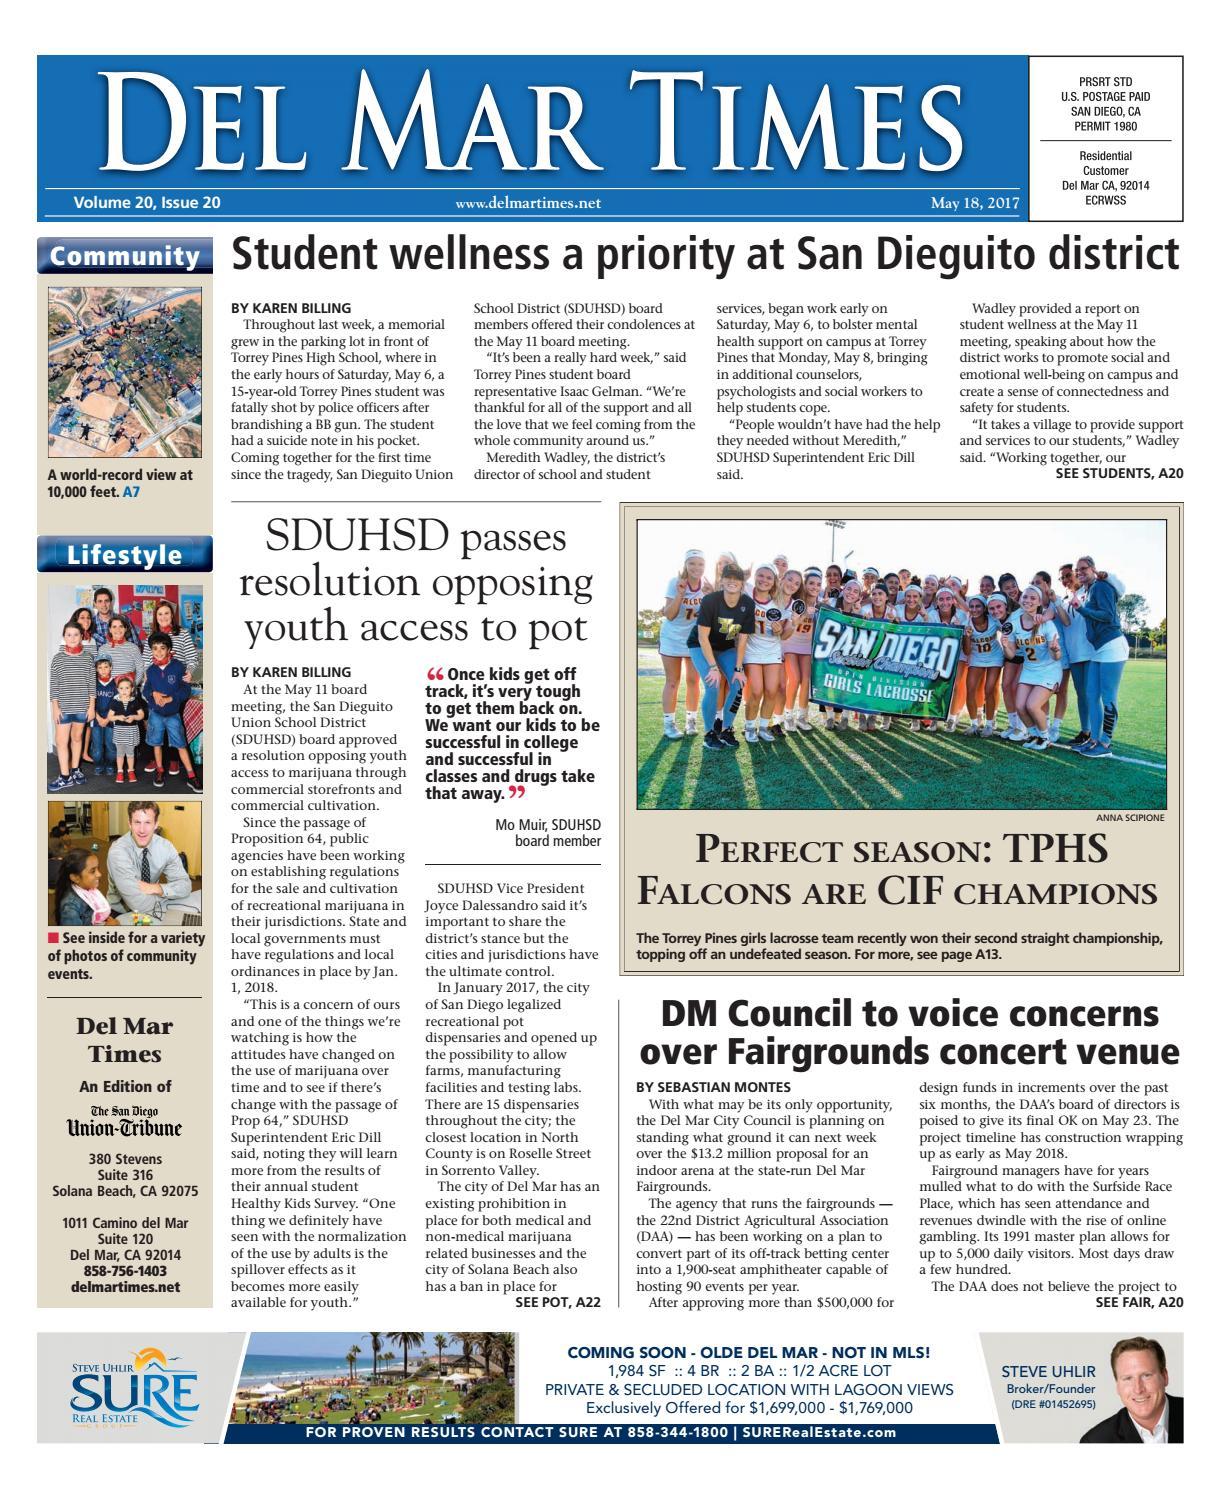 Del Mar Times 05.18.17 by MainStreet Media - issuu